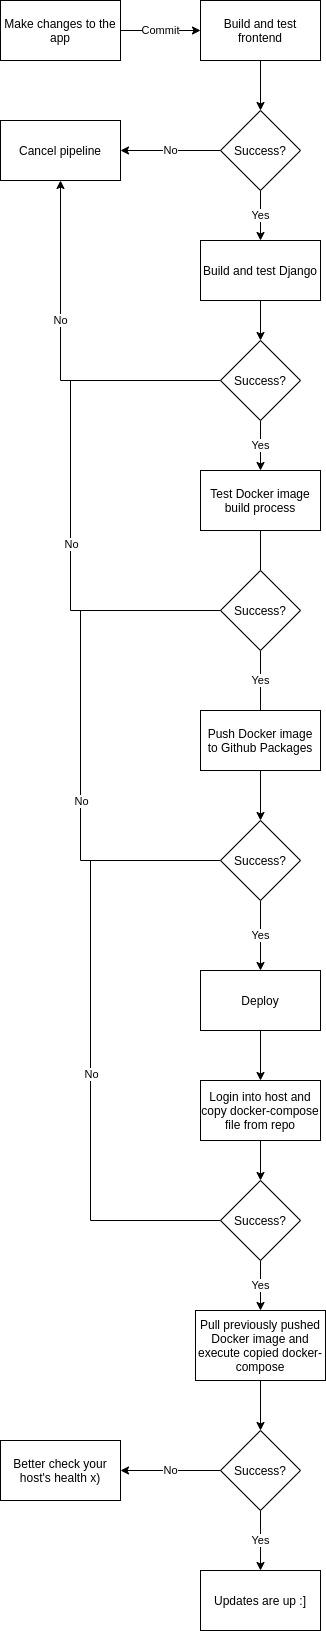 Deploy workflow